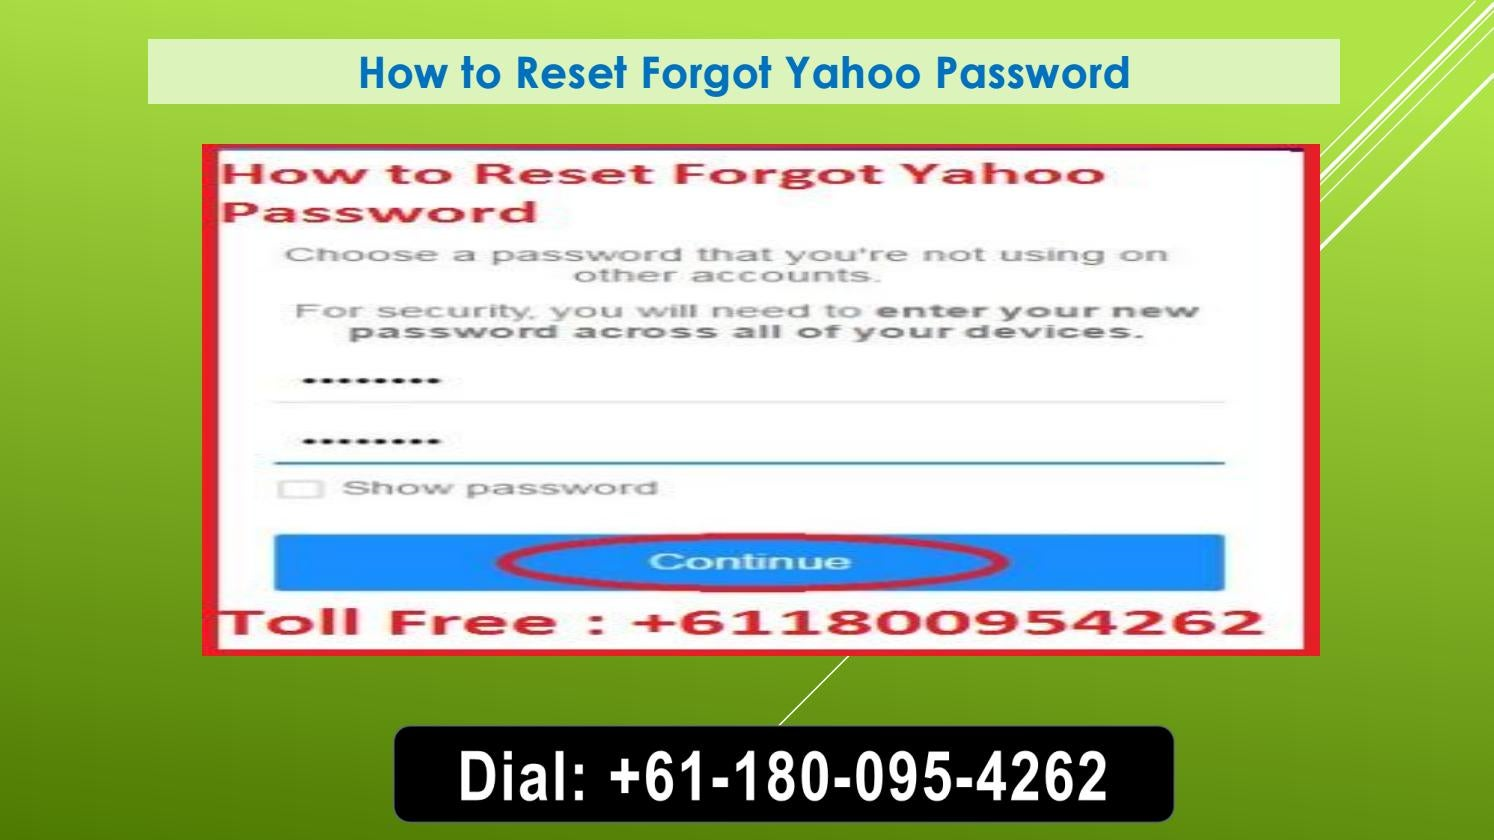 yahoo password forgot help